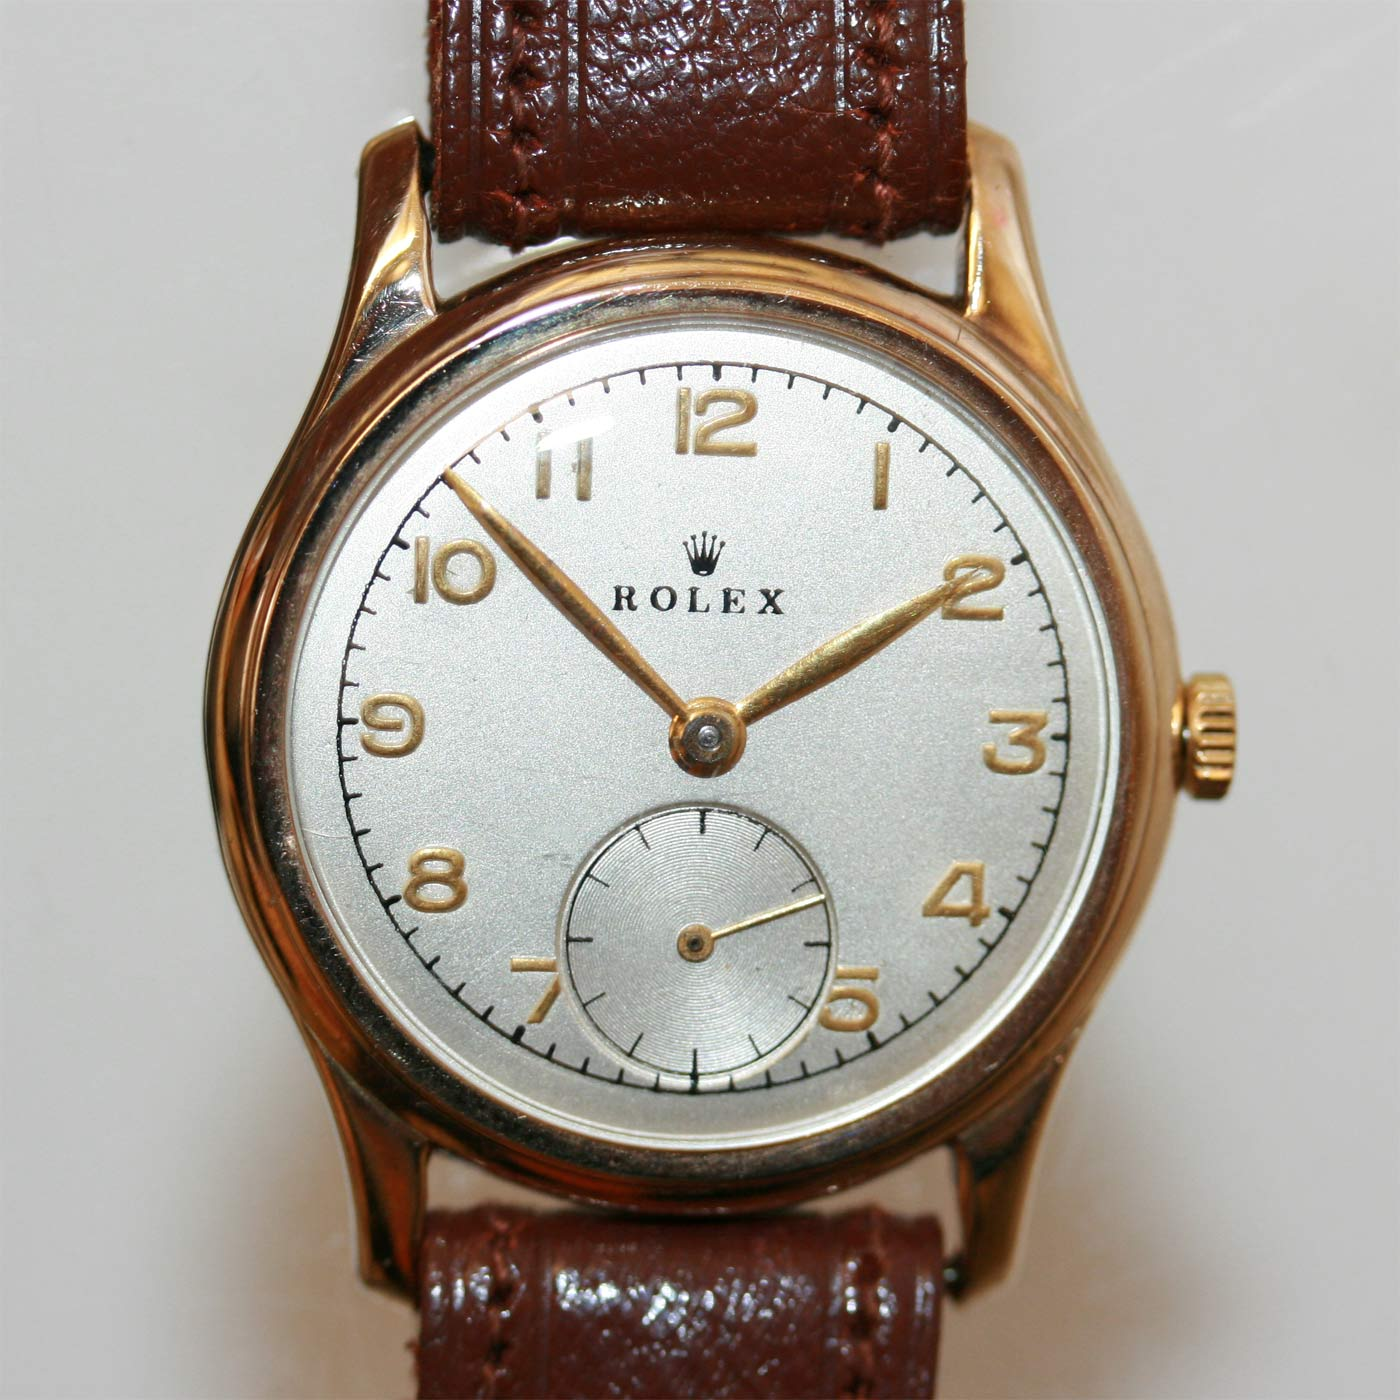 buy vintage 9ct rolex watch sold items sold rolex